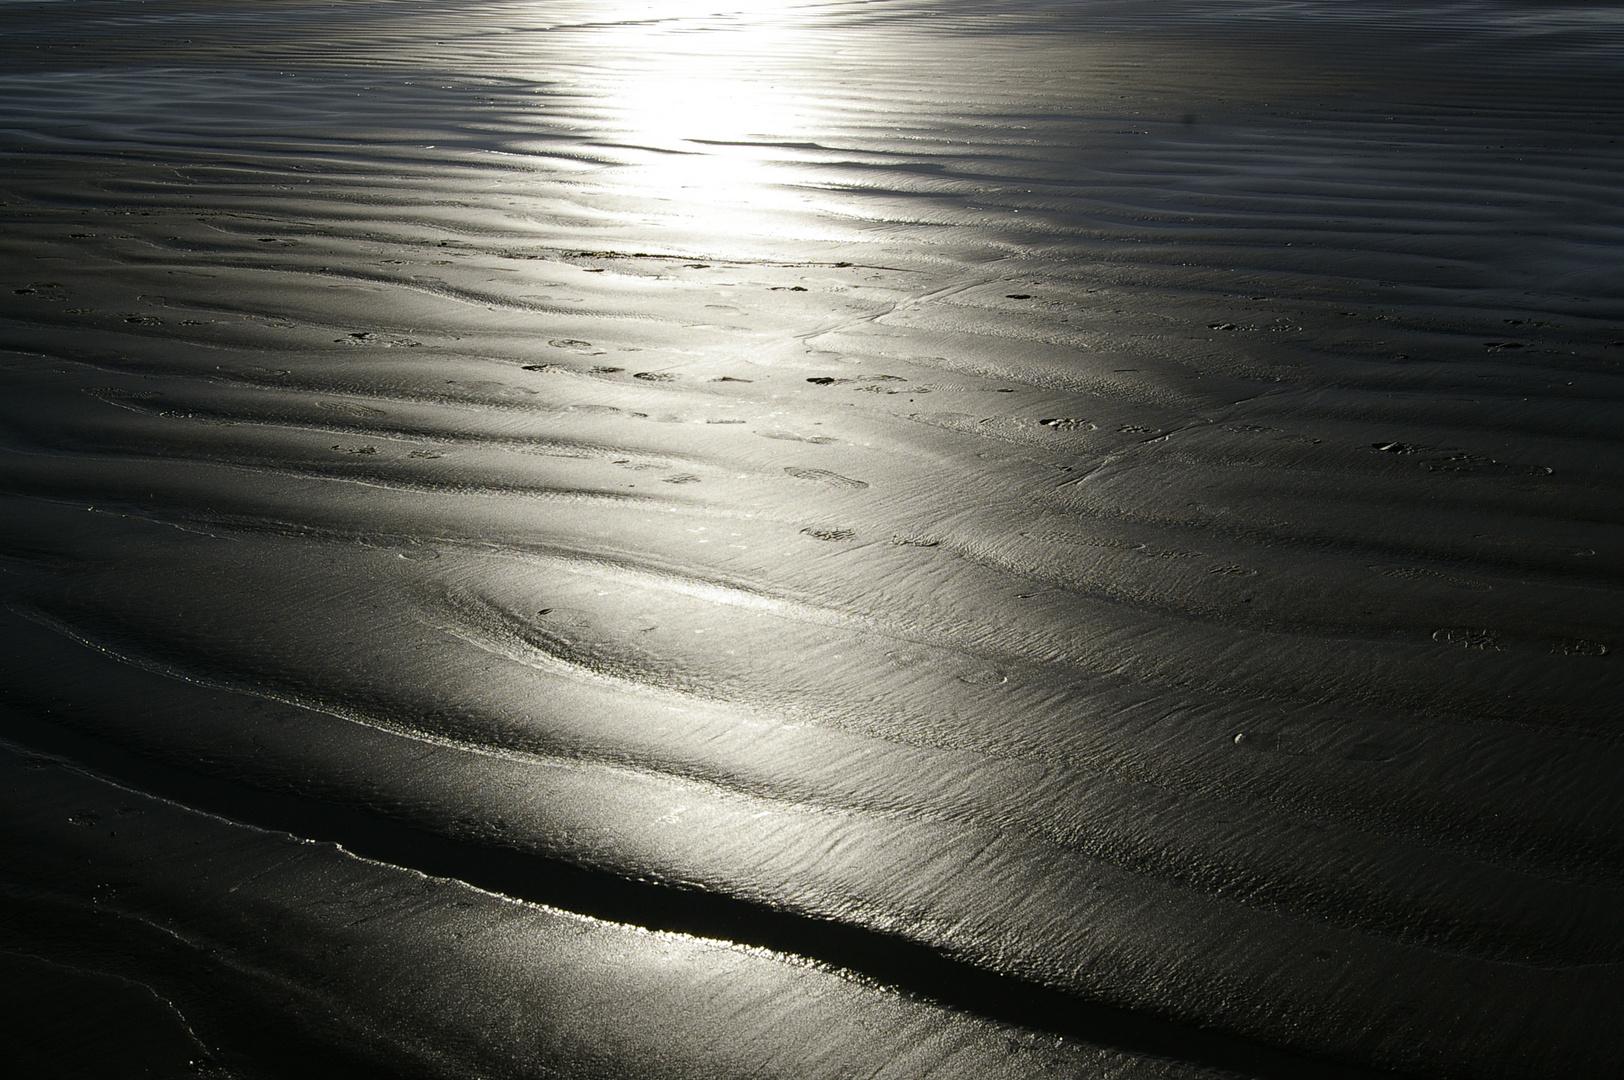 La sable